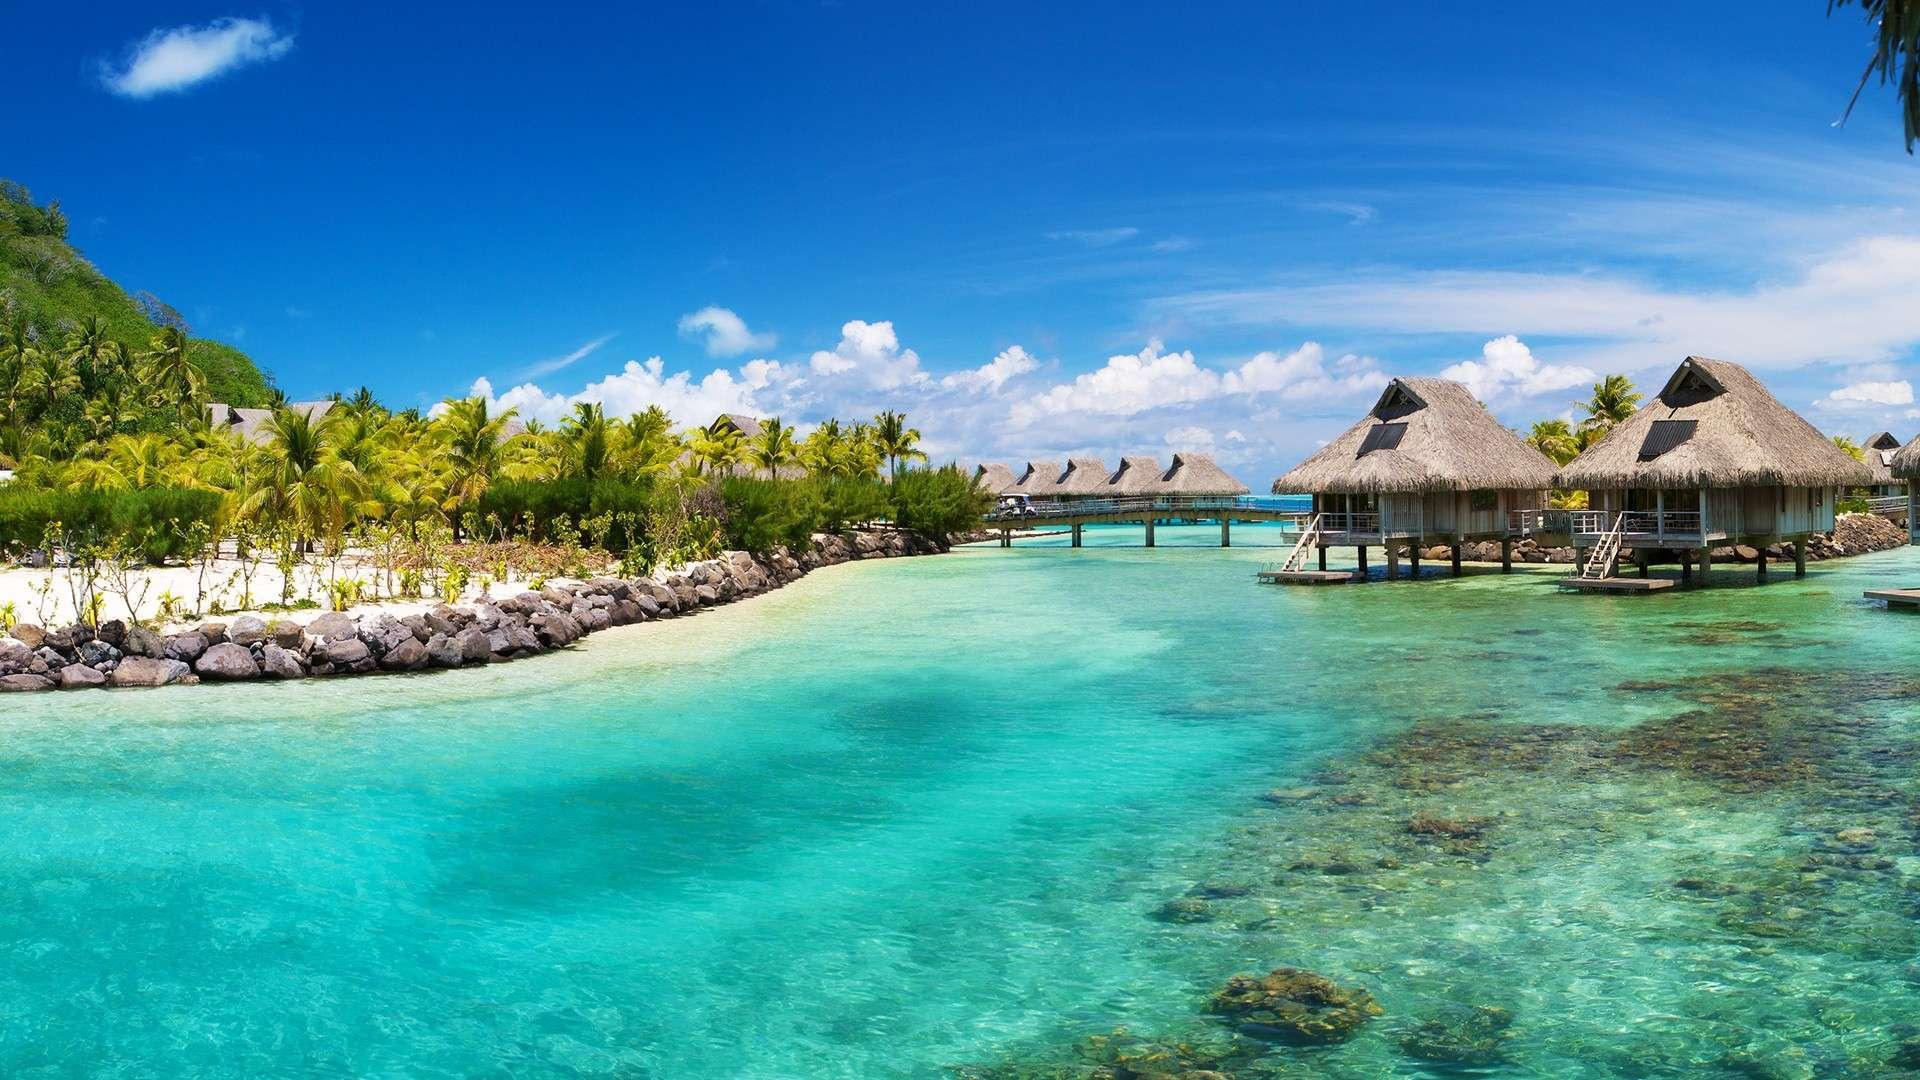 Tropical Island Desktop Wallpapers 1920x1080